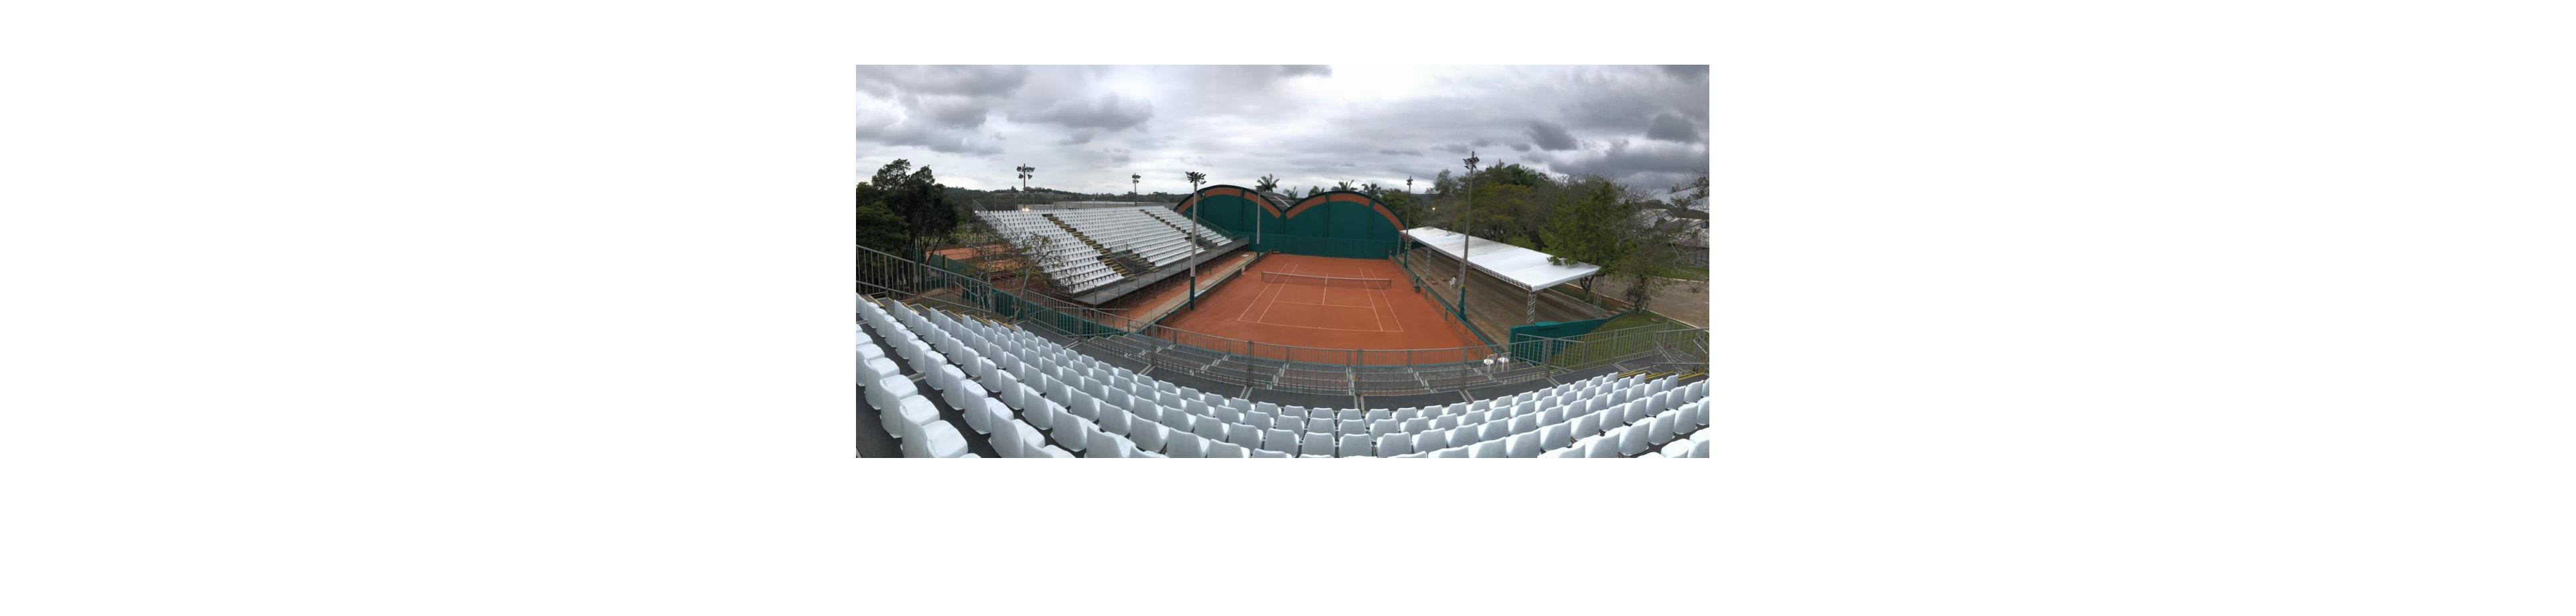 Palco da Copa Davis recebe últimos ajustes para confronto entre Brasil e Barbados